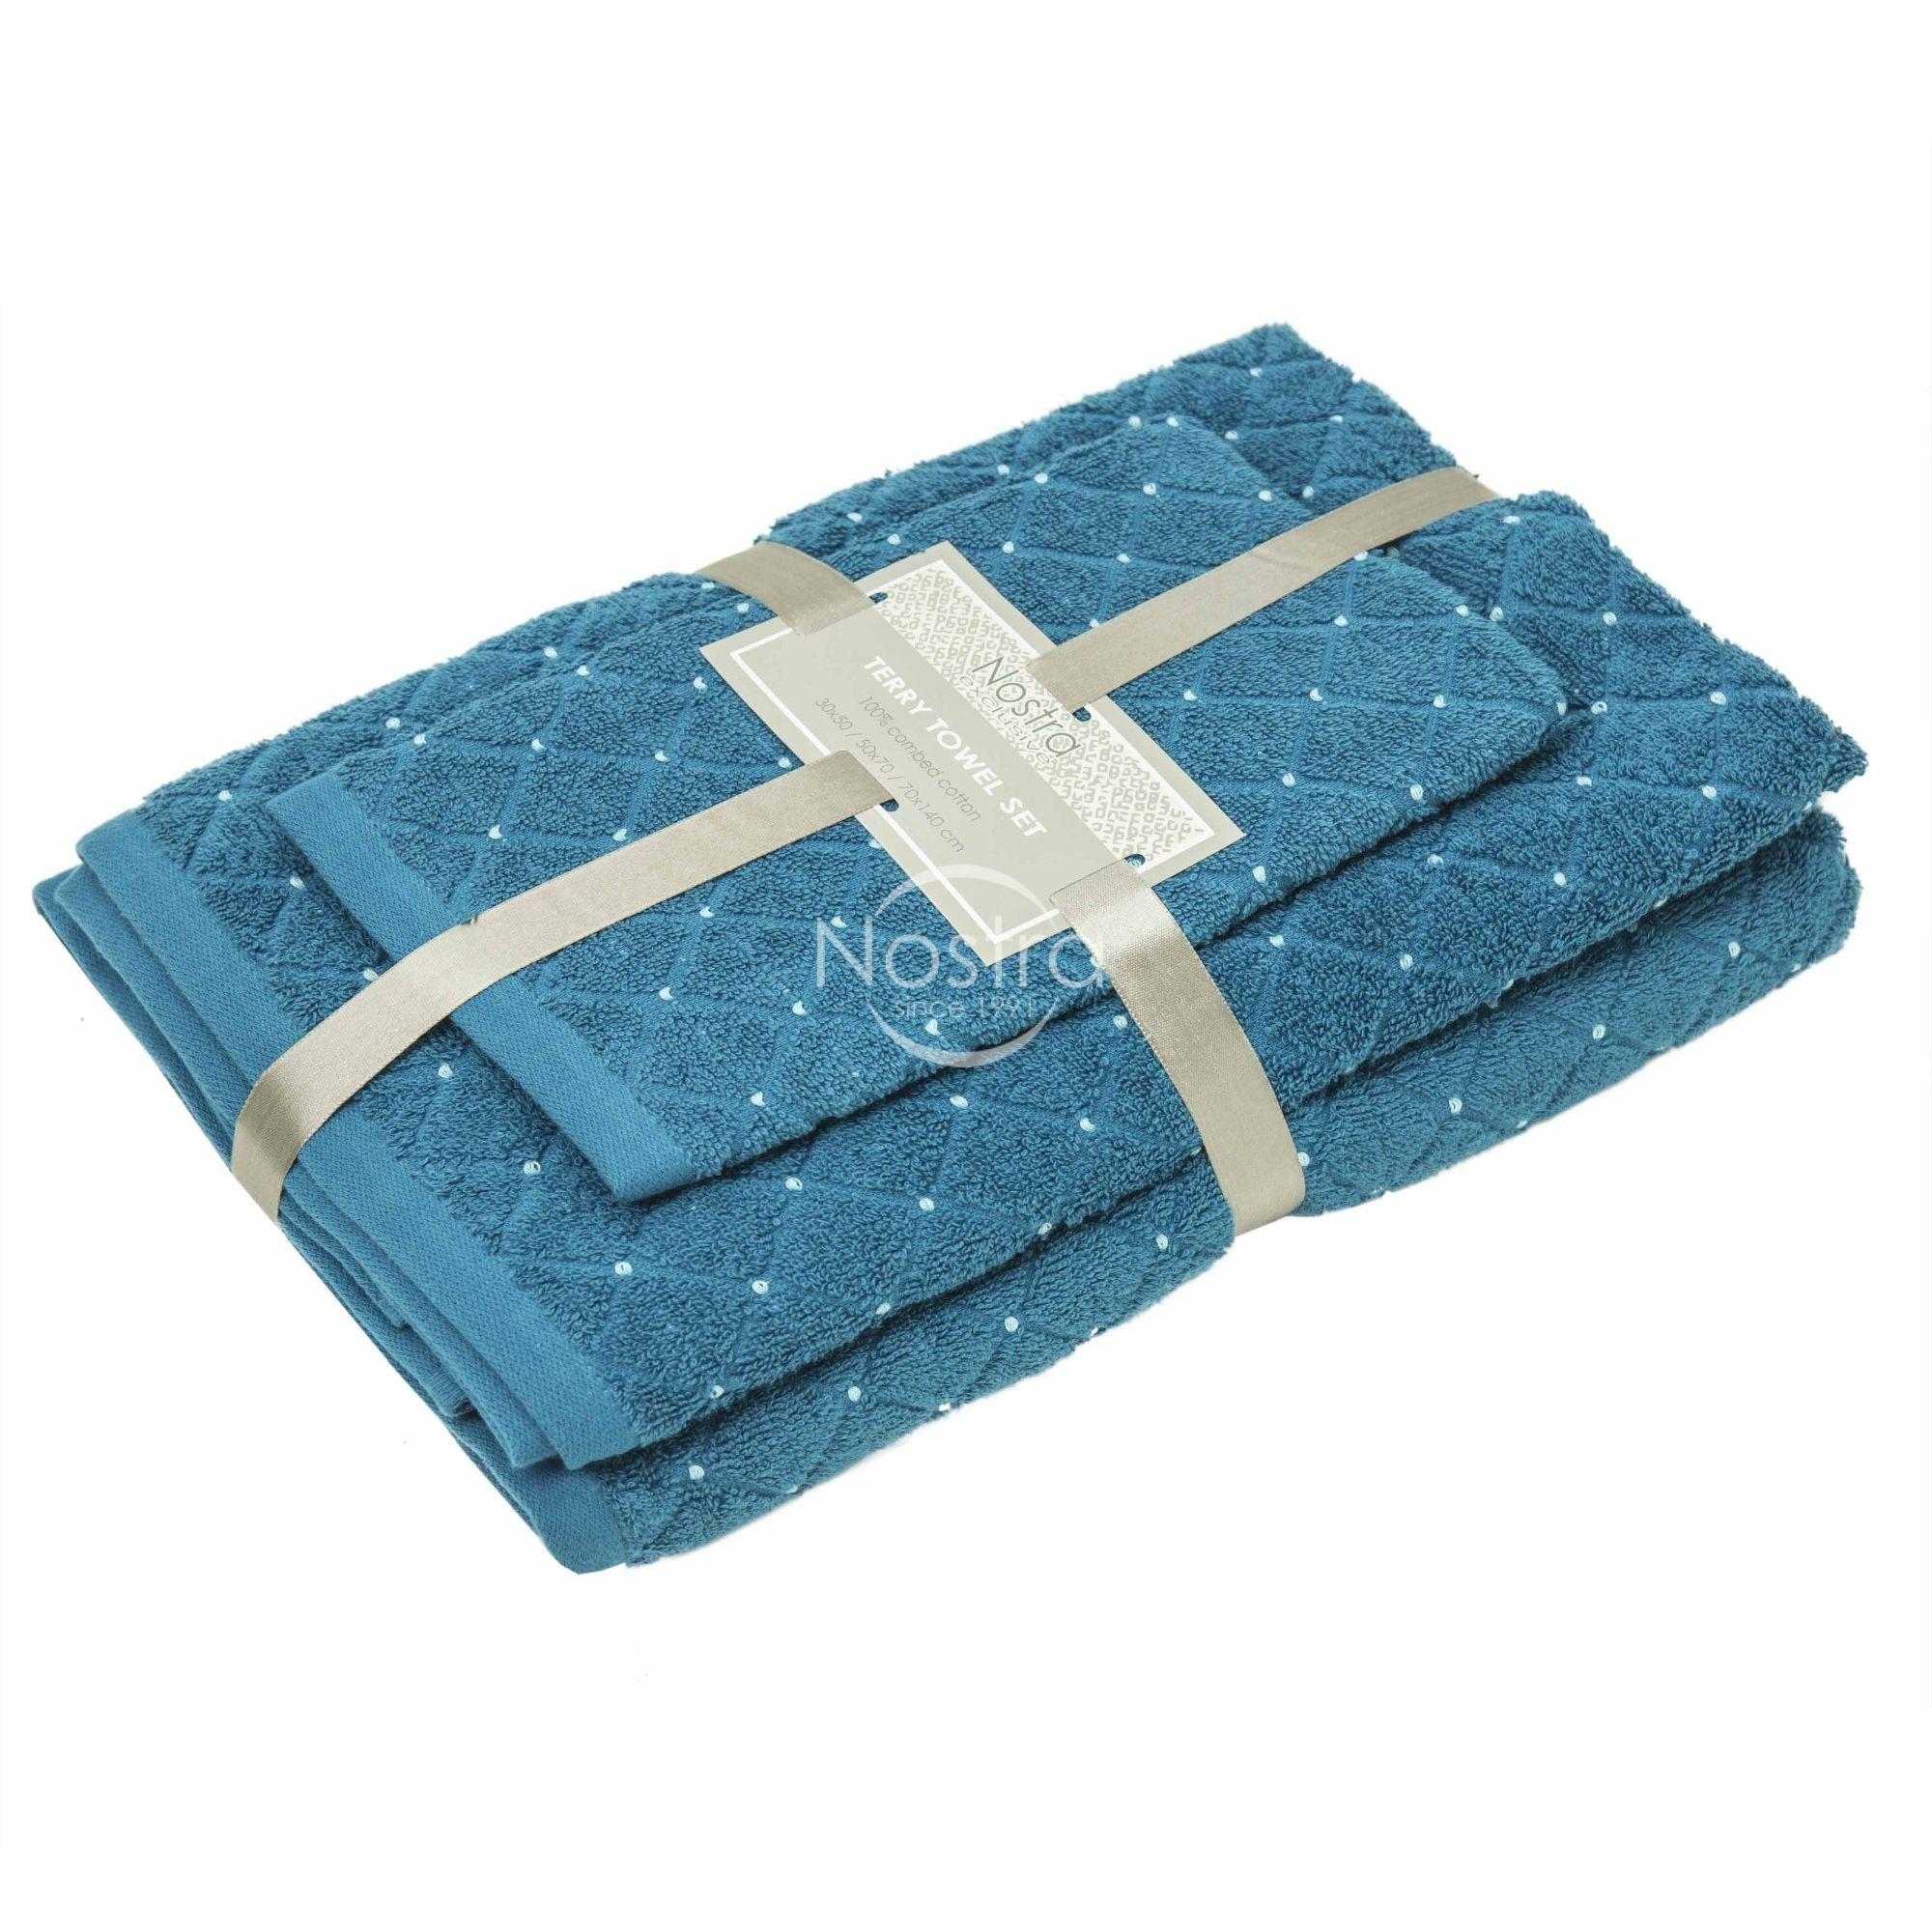 3 dalių rankšluosčių komplektas T0107 T0107-MOSAIC BLUE 30x50, 50x70, 70x140 cm